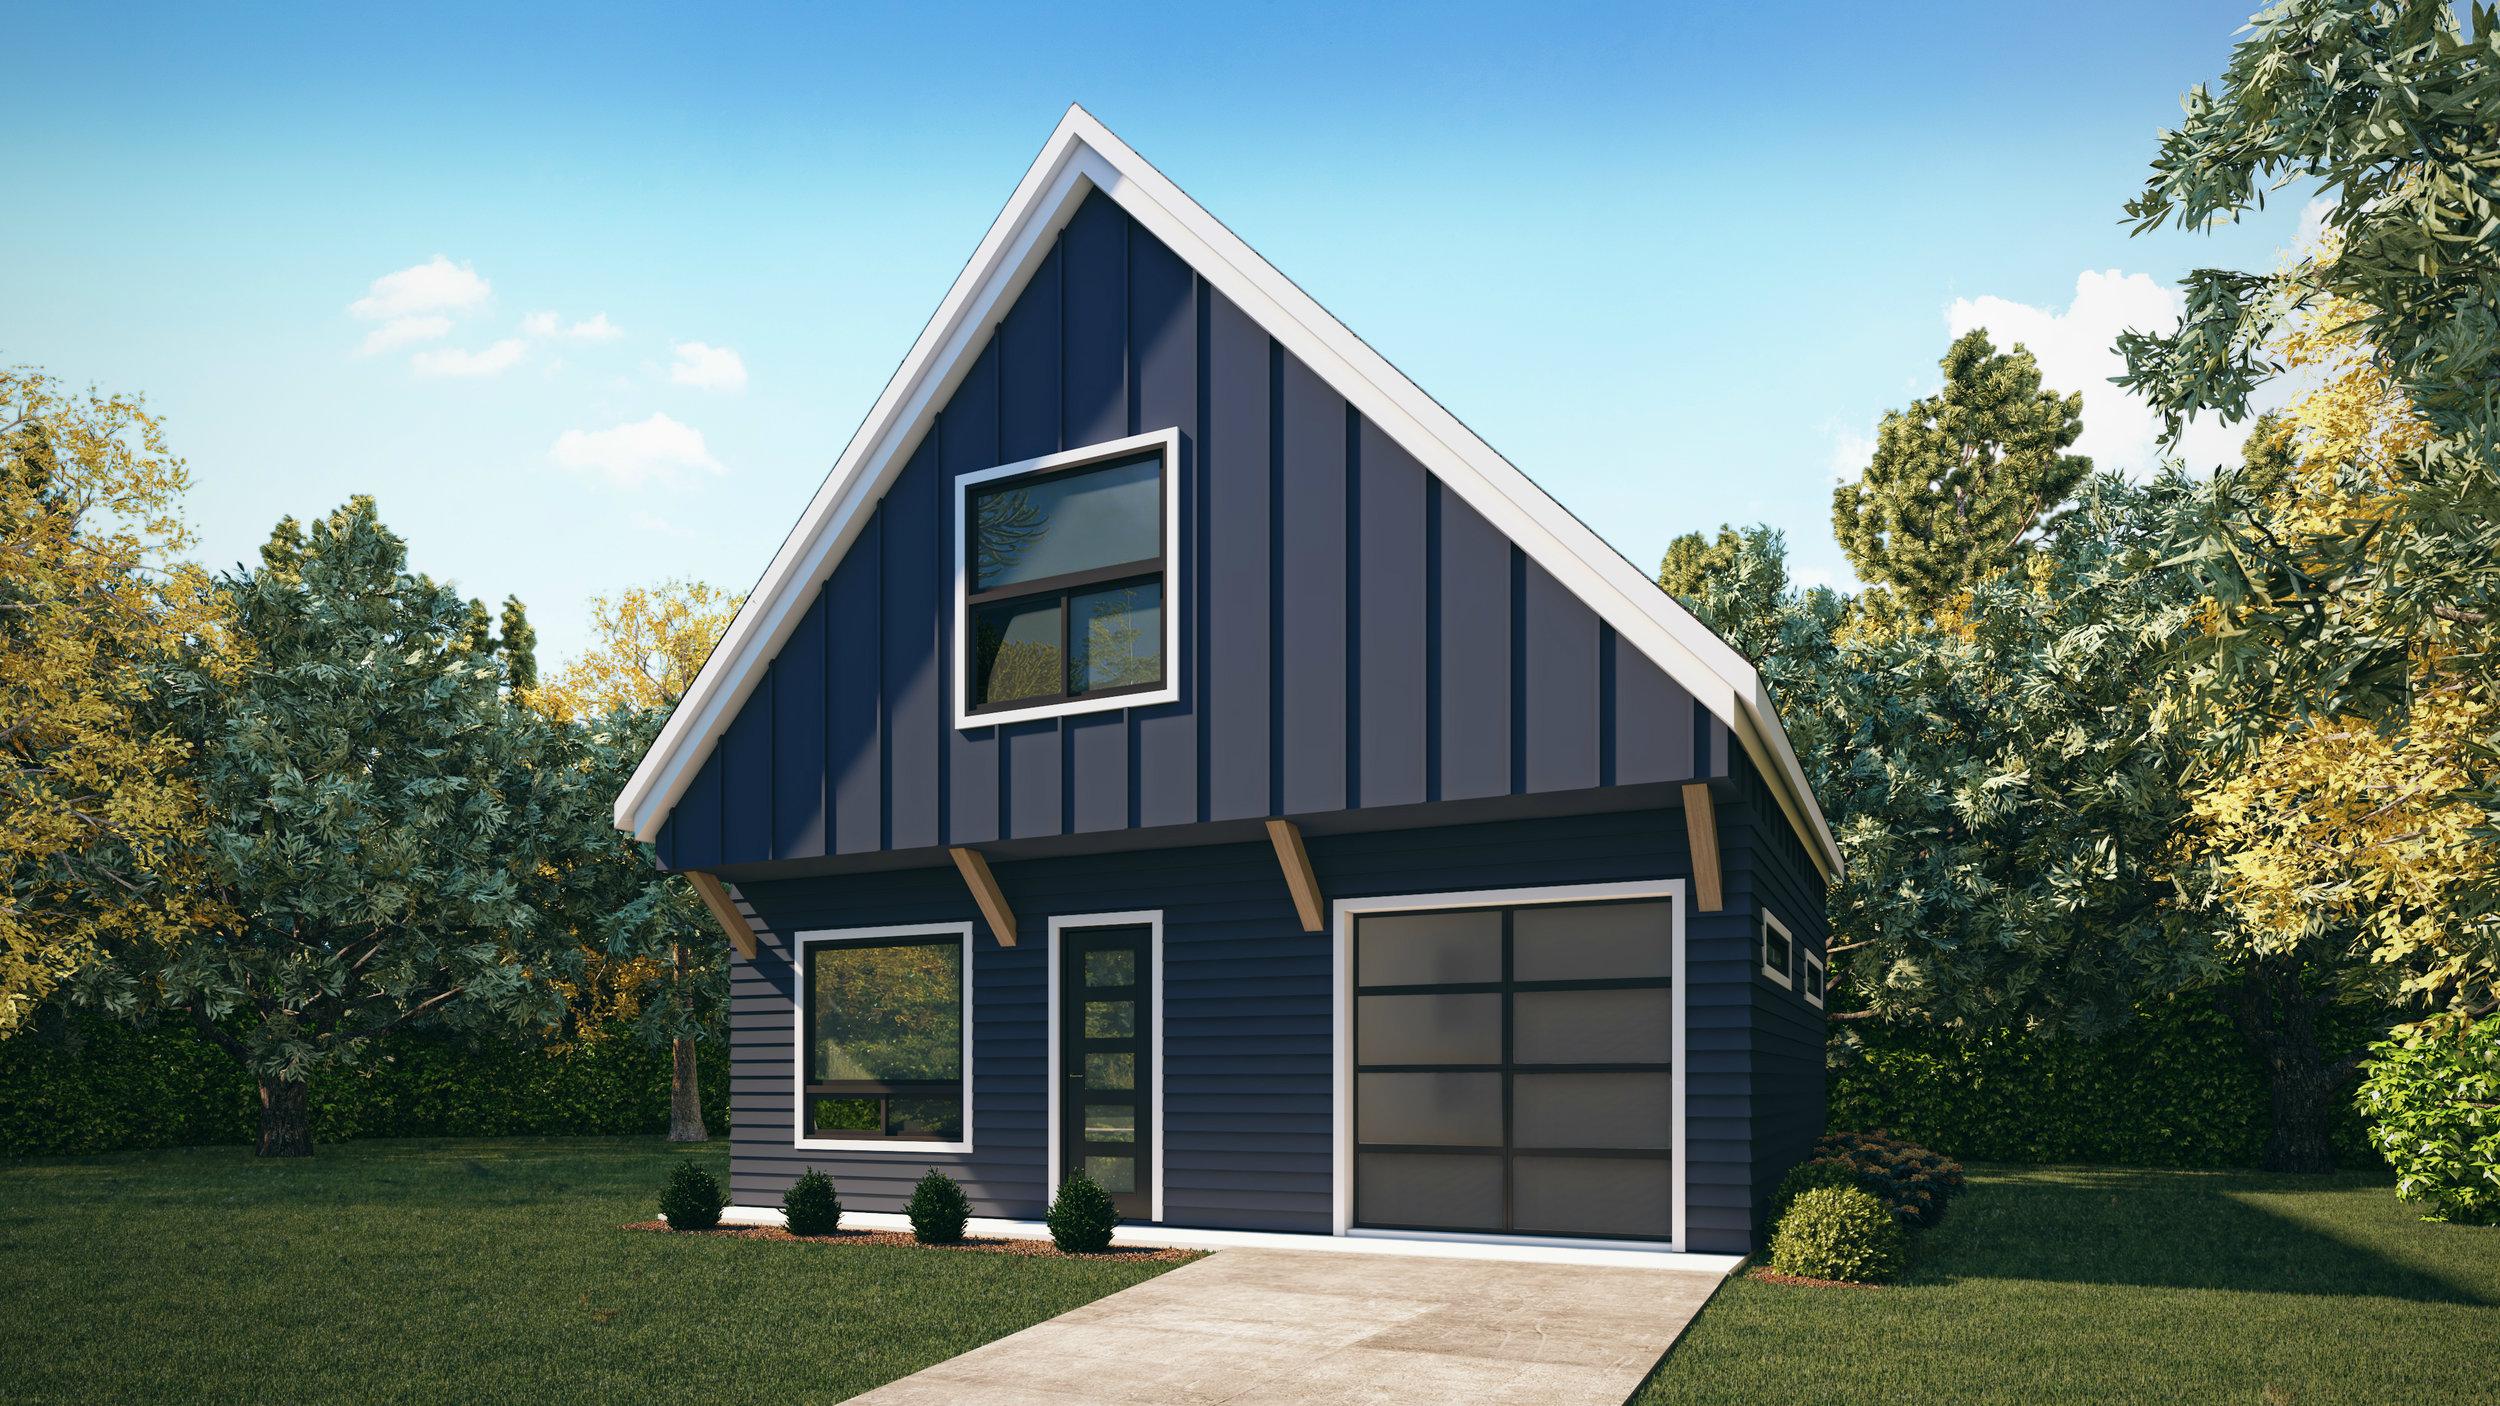 20180709 austin property buyers - 504  normandy unit b - exterior - final hires.JPG